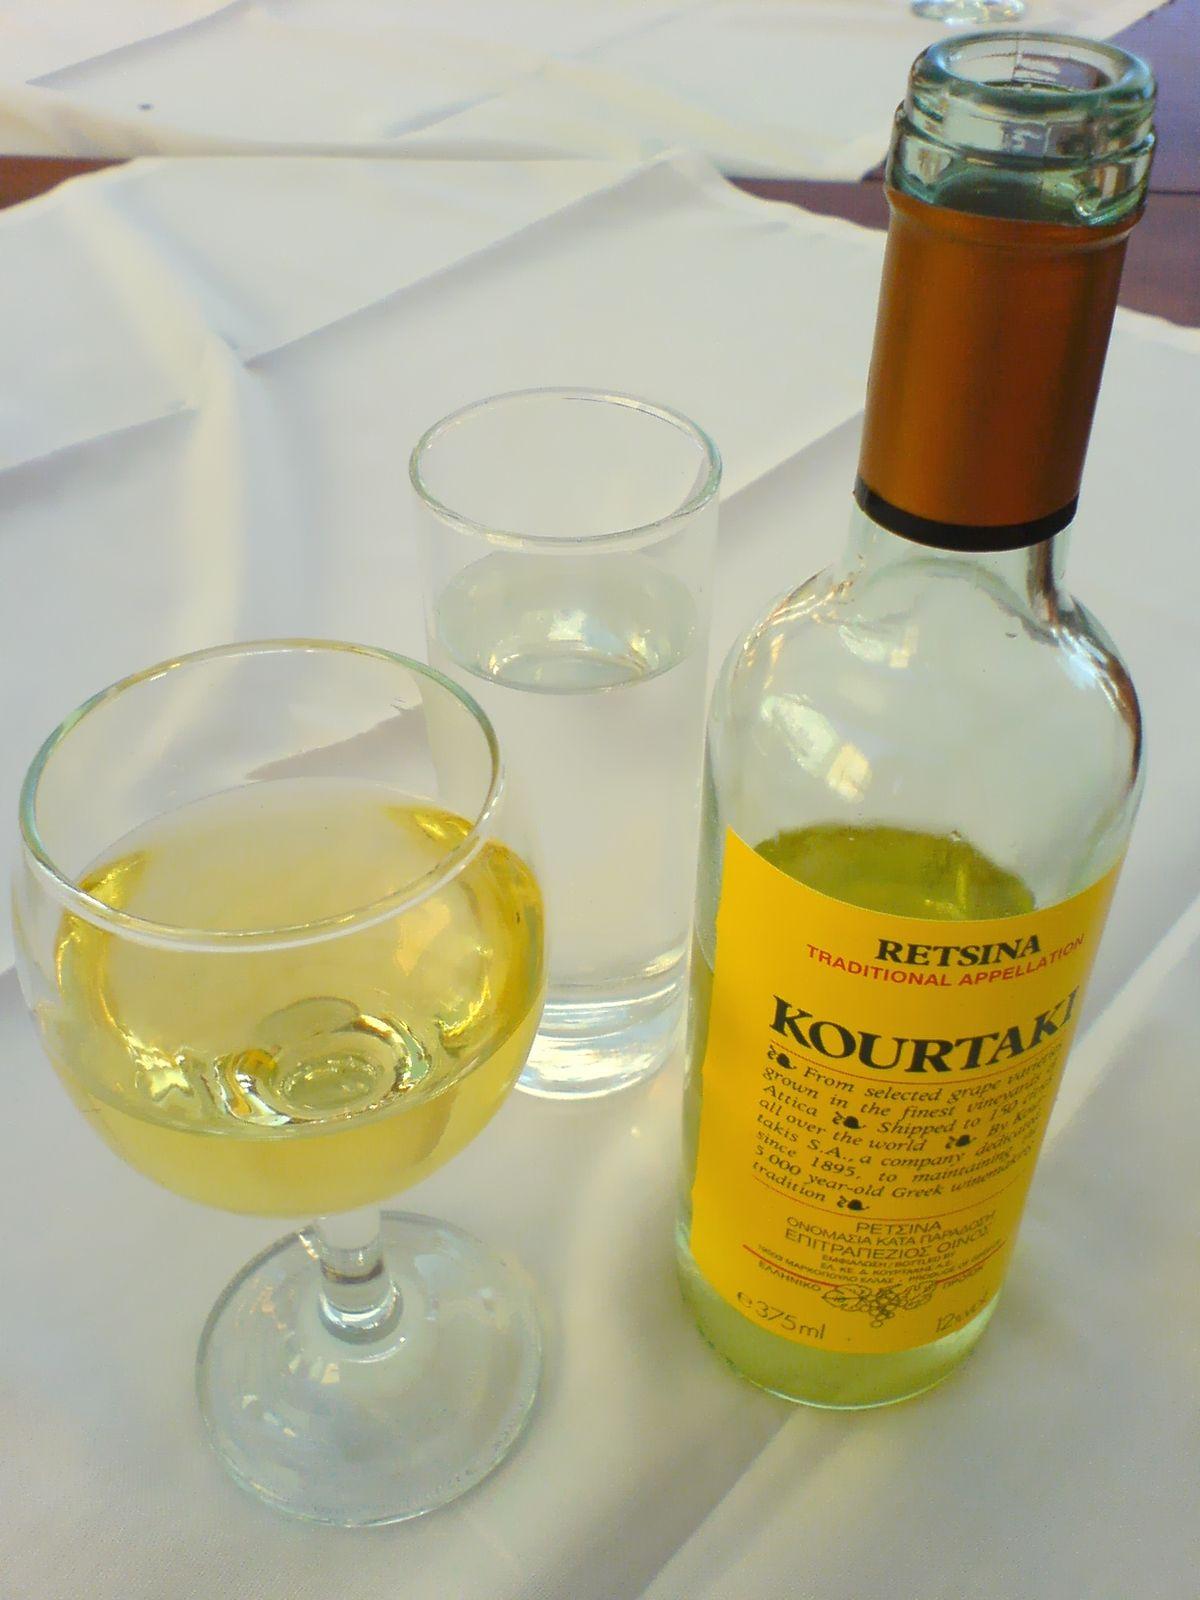 Retsina - Wikipedia